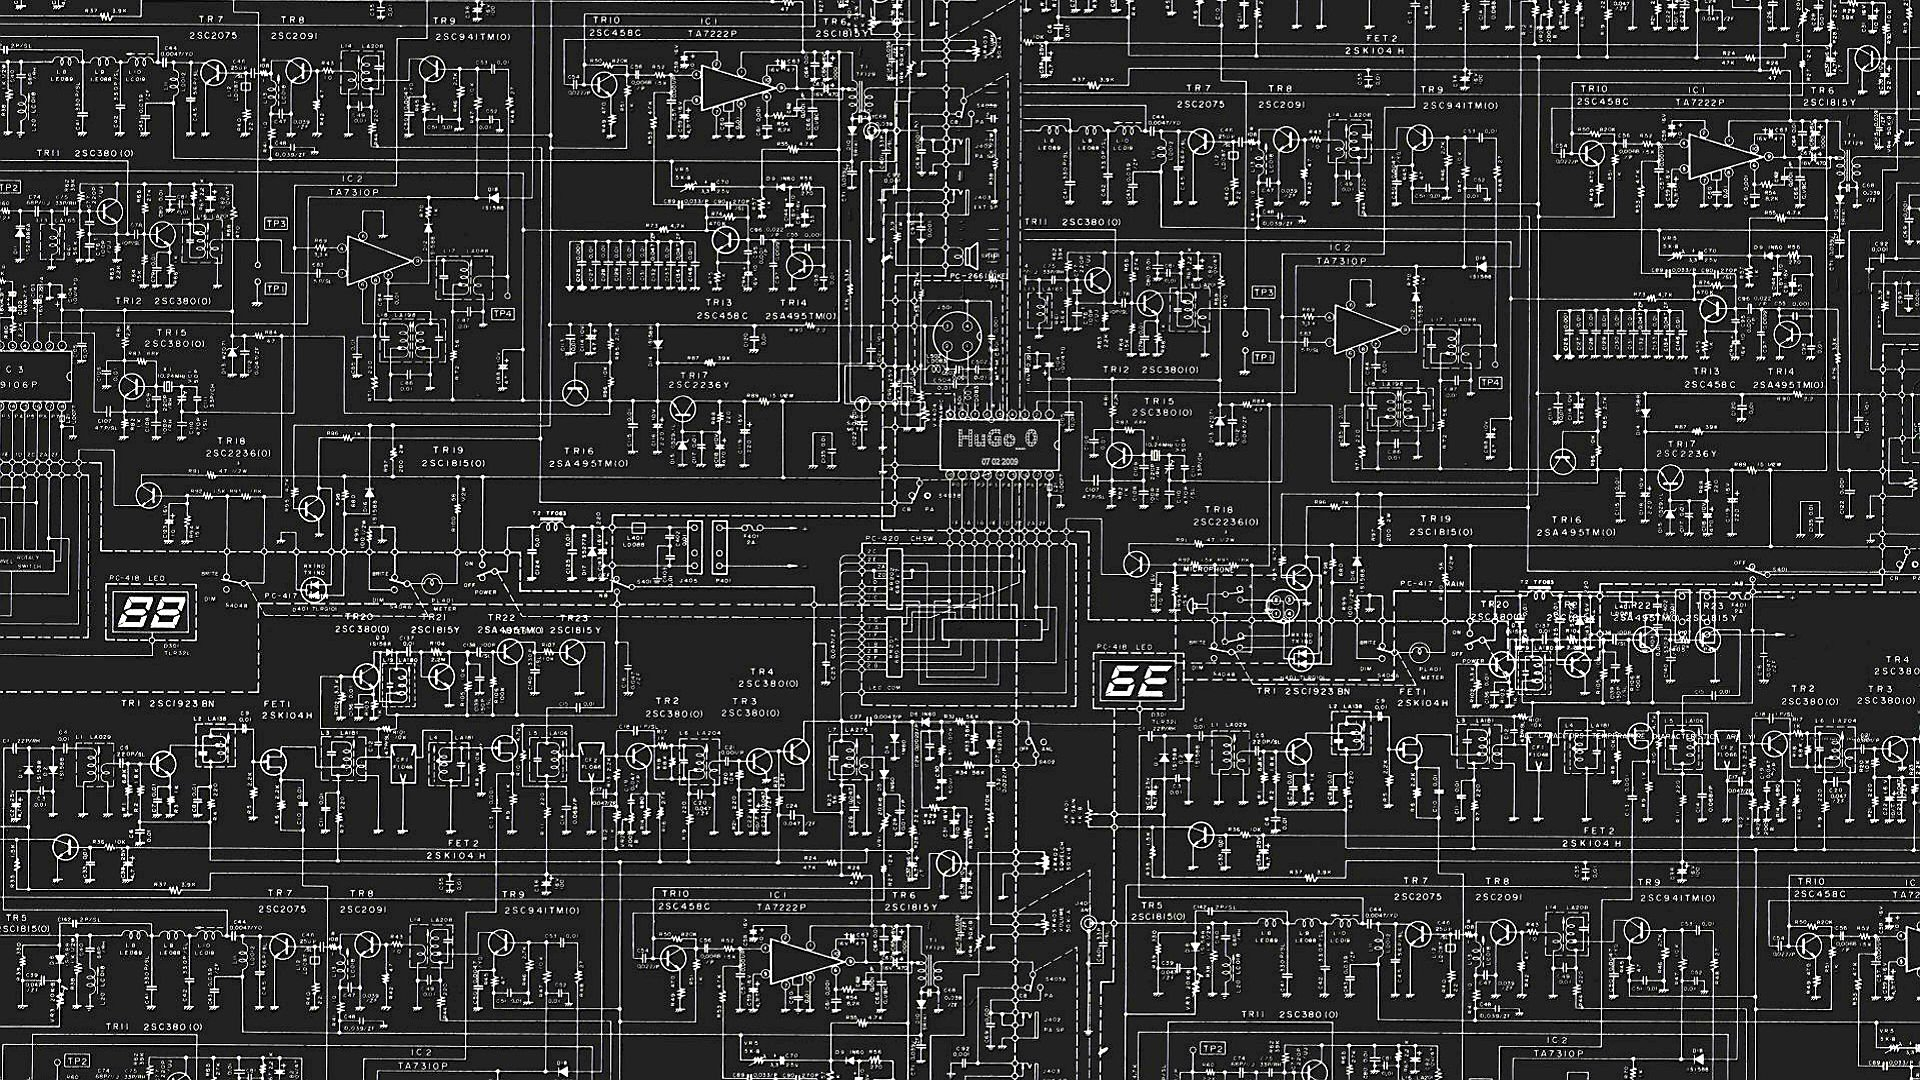 Computer engineering science tech wallpaper 1920x1080 456757 1920x1080